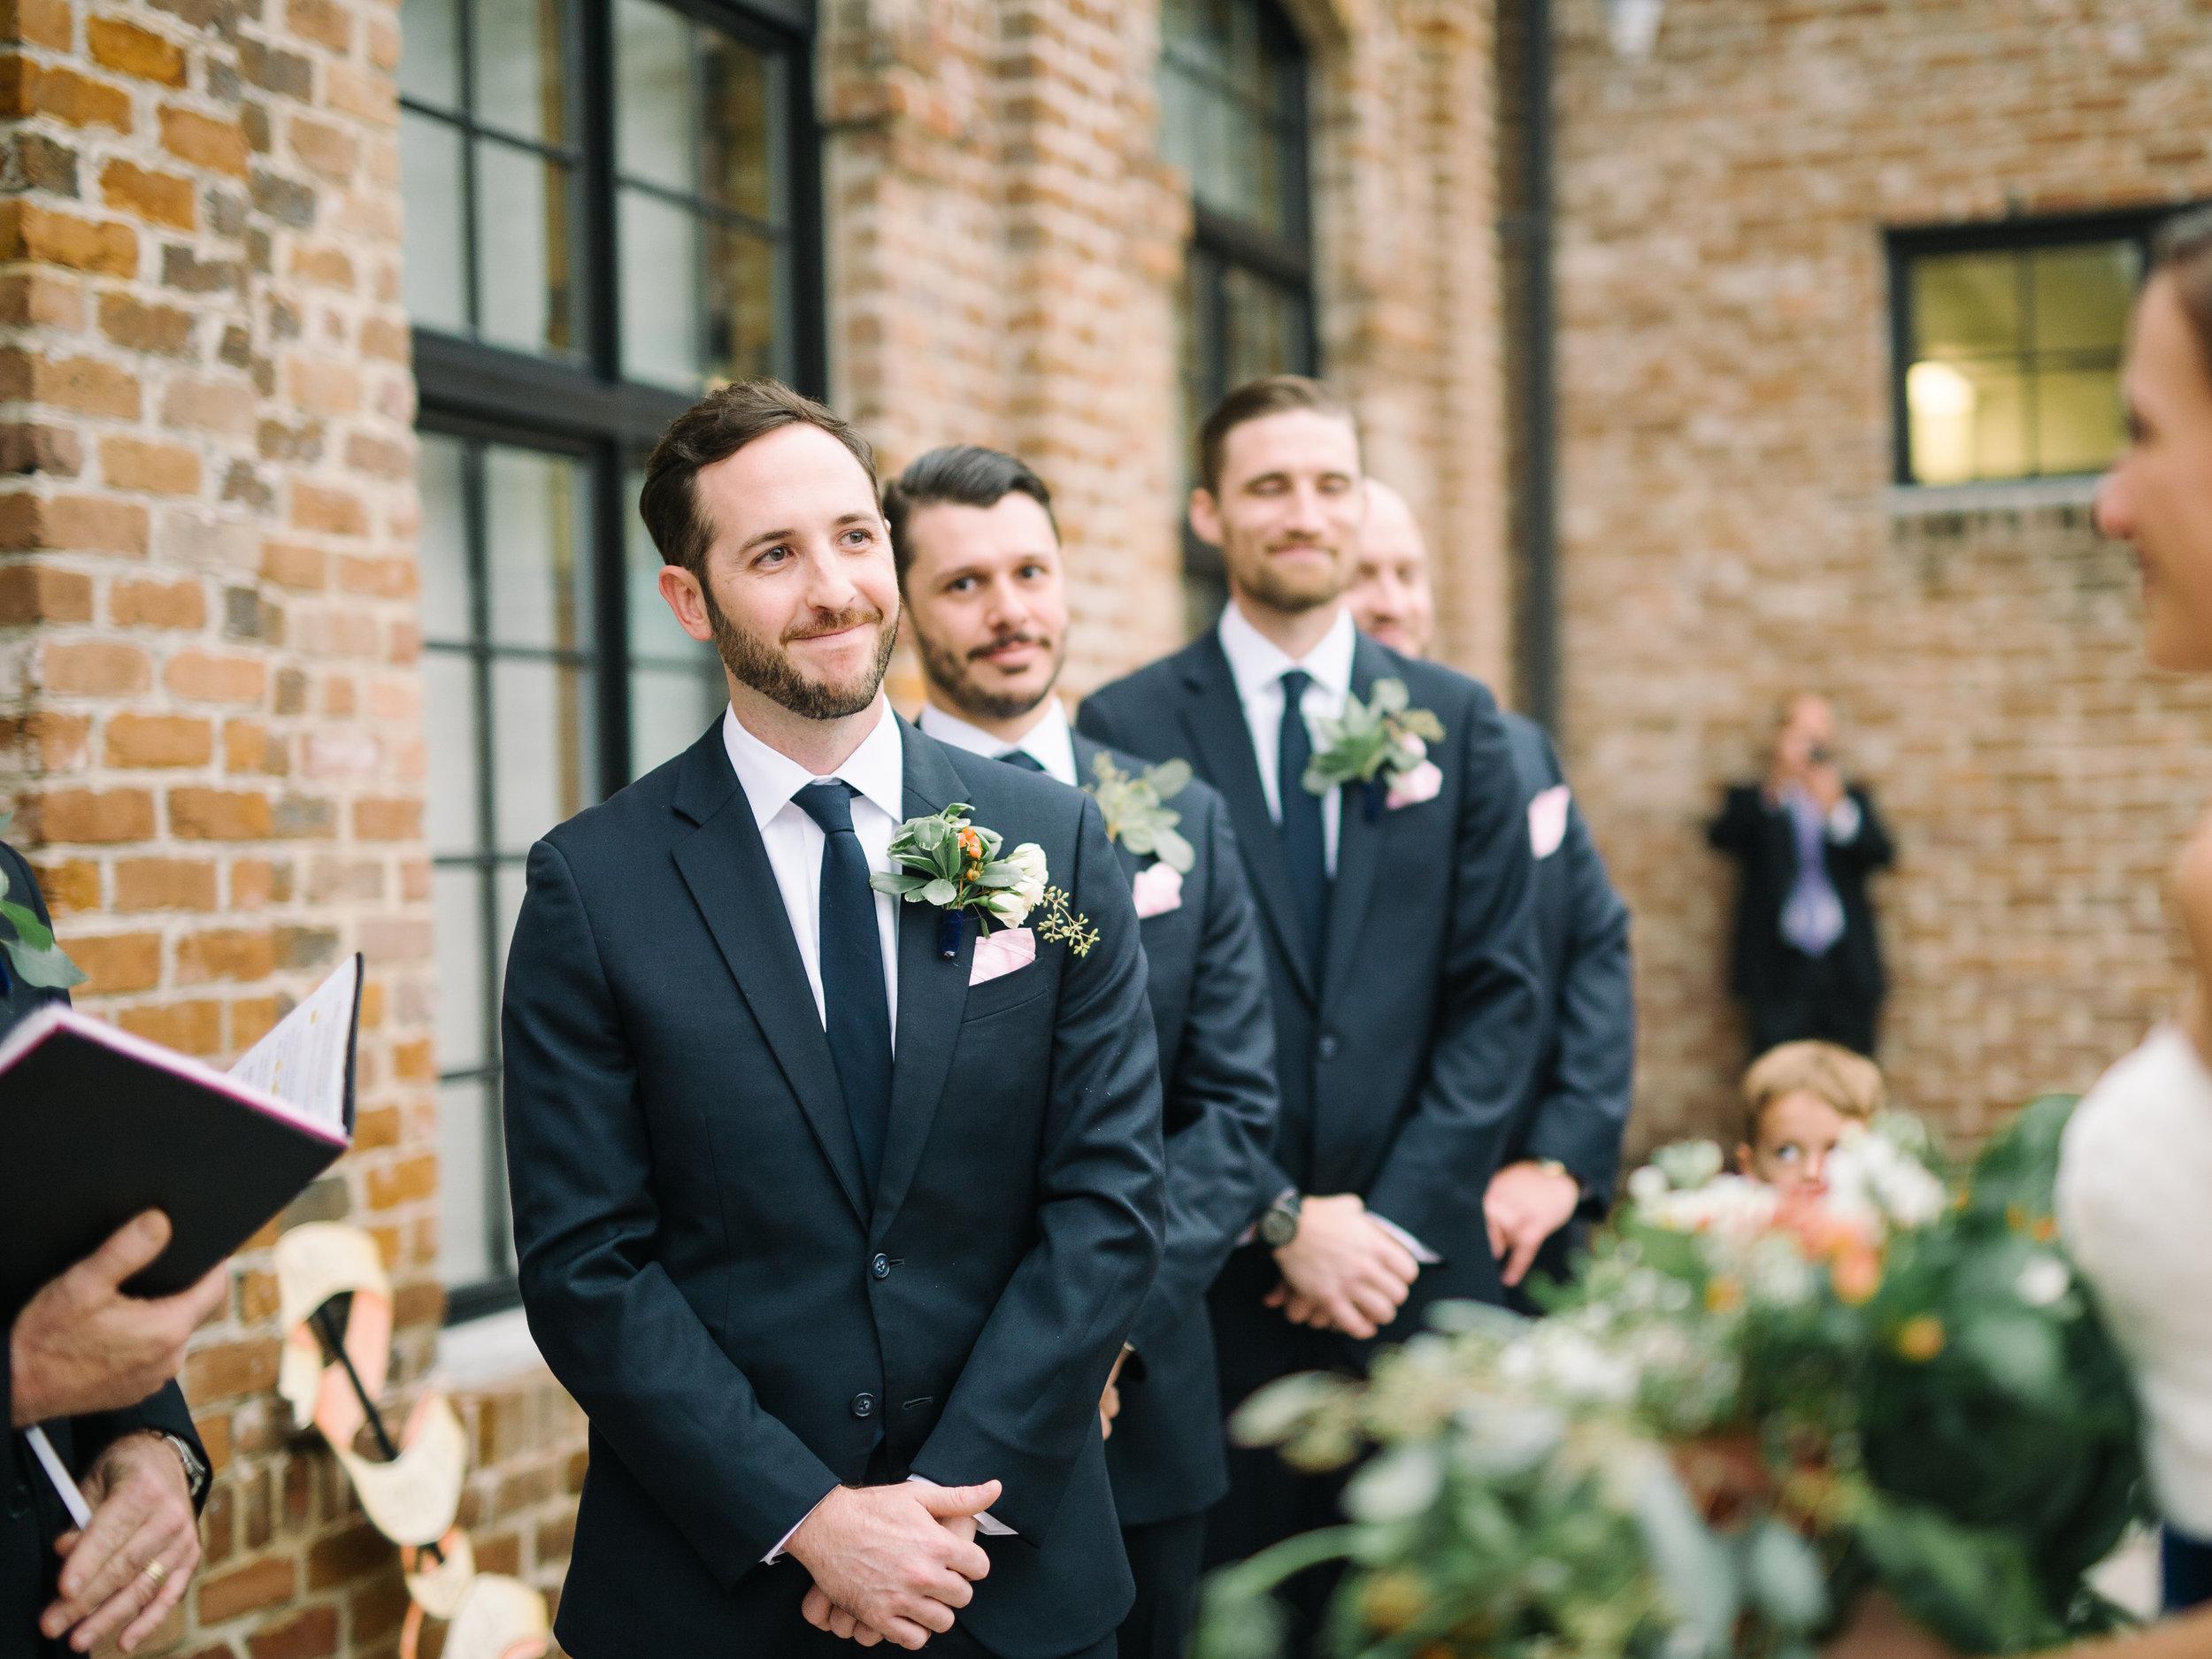 amber-and-paul-rach-loves-troy-charles-h-morris-center-wedding-sarah-seven-helene-lace-wedding-dress-ivory-and-beau-bridal-boutique-savannah-wedding-planner-savannah-event-designer-savannah-florist-savannah-weddings-savannah-bridal-boutique-26.jpg